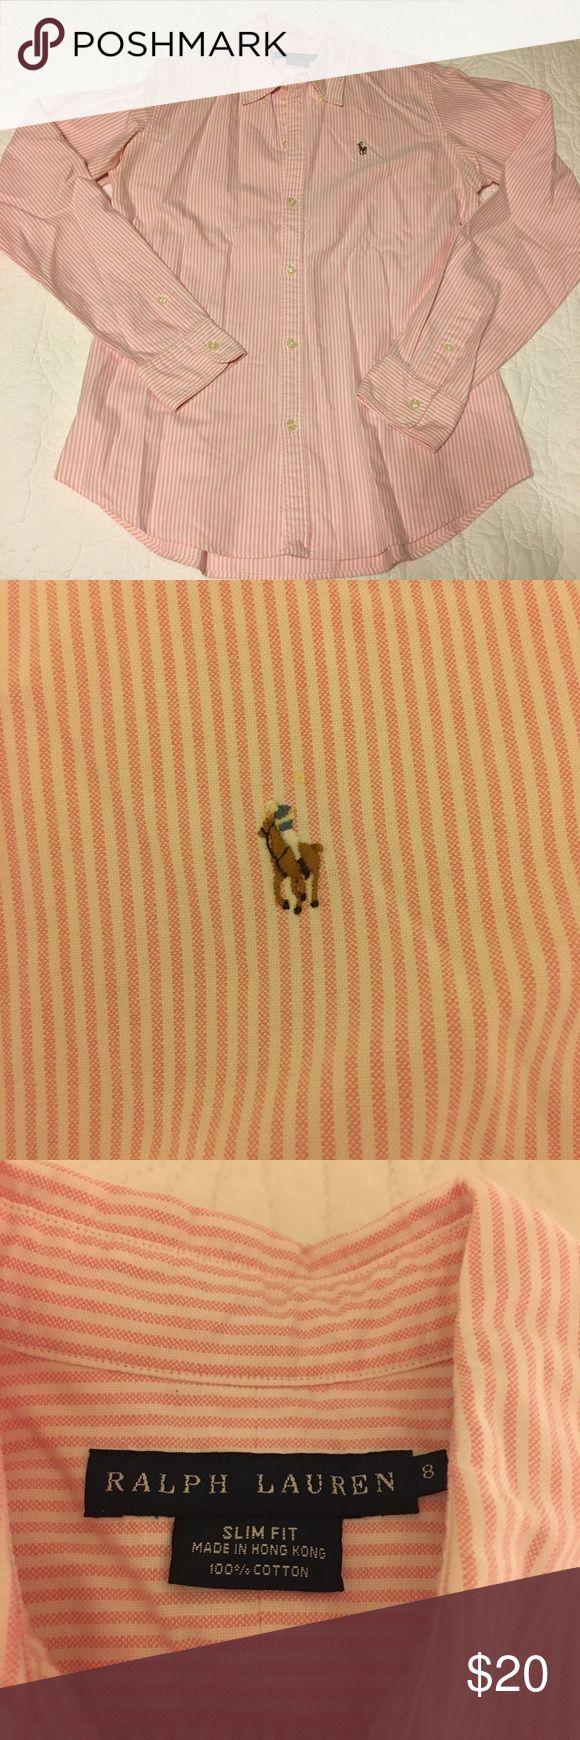 Polo Ralph Lauren women's striped Oxford Pink striped oxford in EUC by polo Ralph Lauren. Ralph Lauren Tops Button Down Shirts